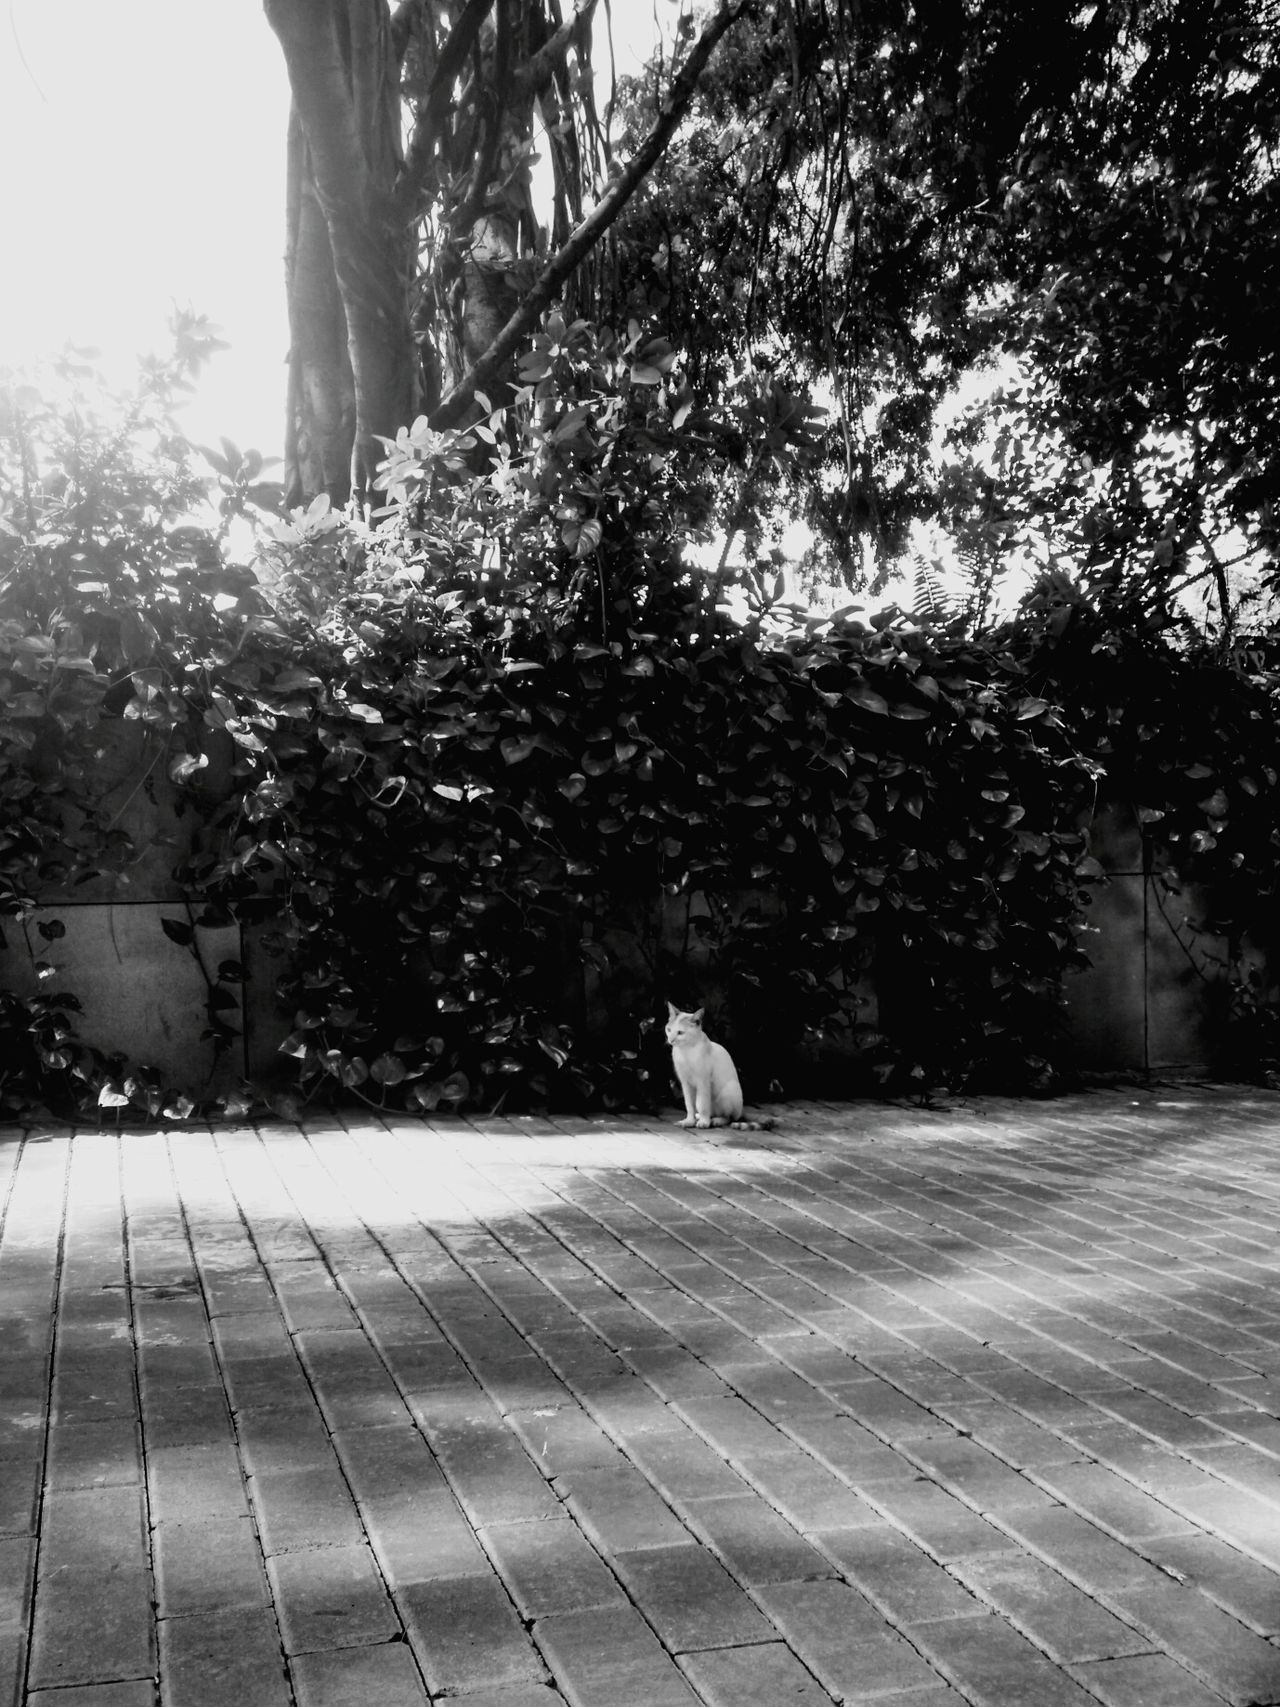 Cats 🐱 Still Life Chill Mode Check This Out Blackandwhitecat EyeEm Nature Lover Eyeem Market Randomshot